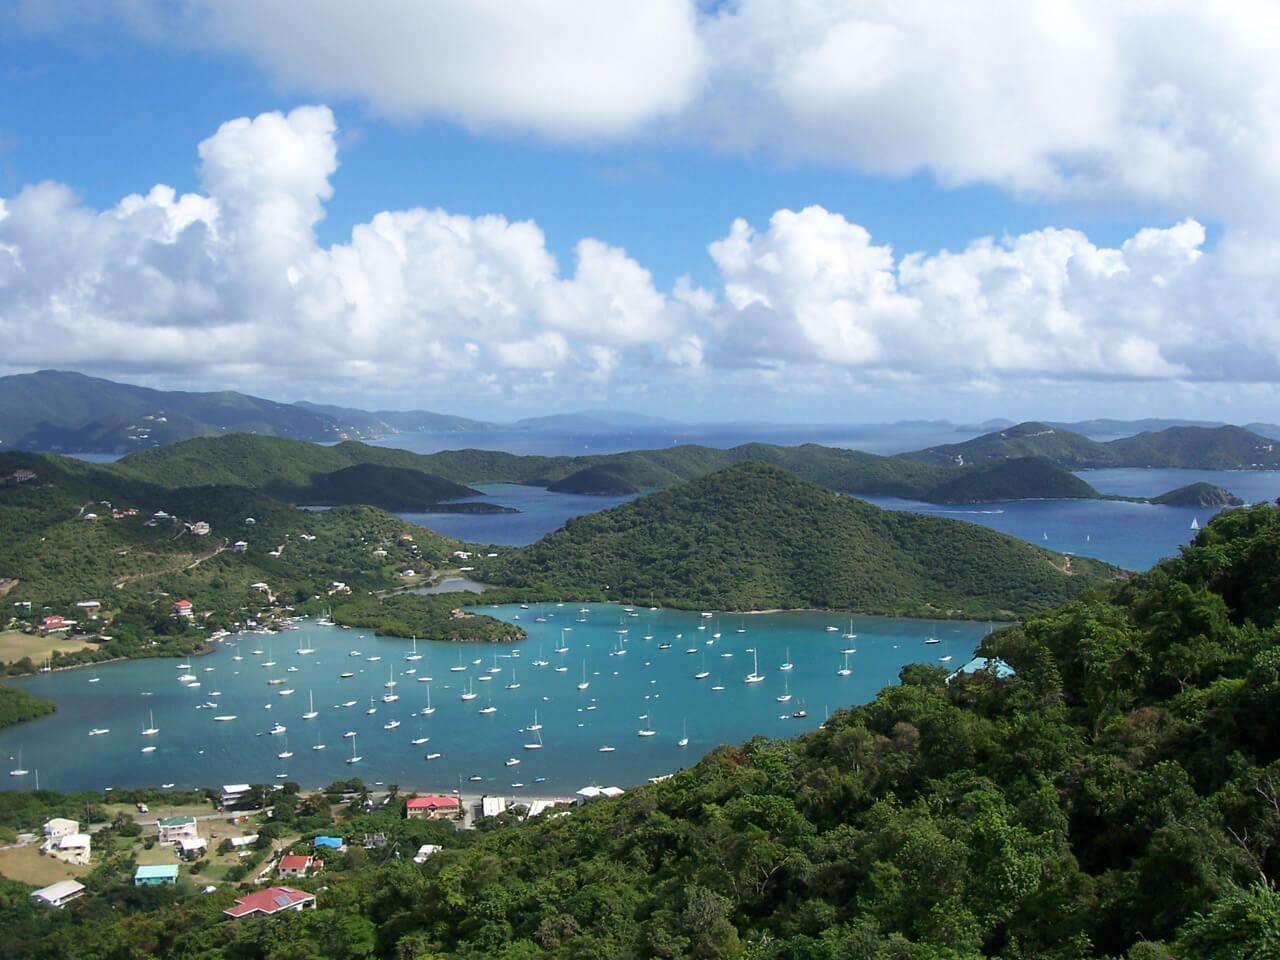 The View from Waterlemon Villa - Coral Bay Harbor, St. John, US Virgin Islands